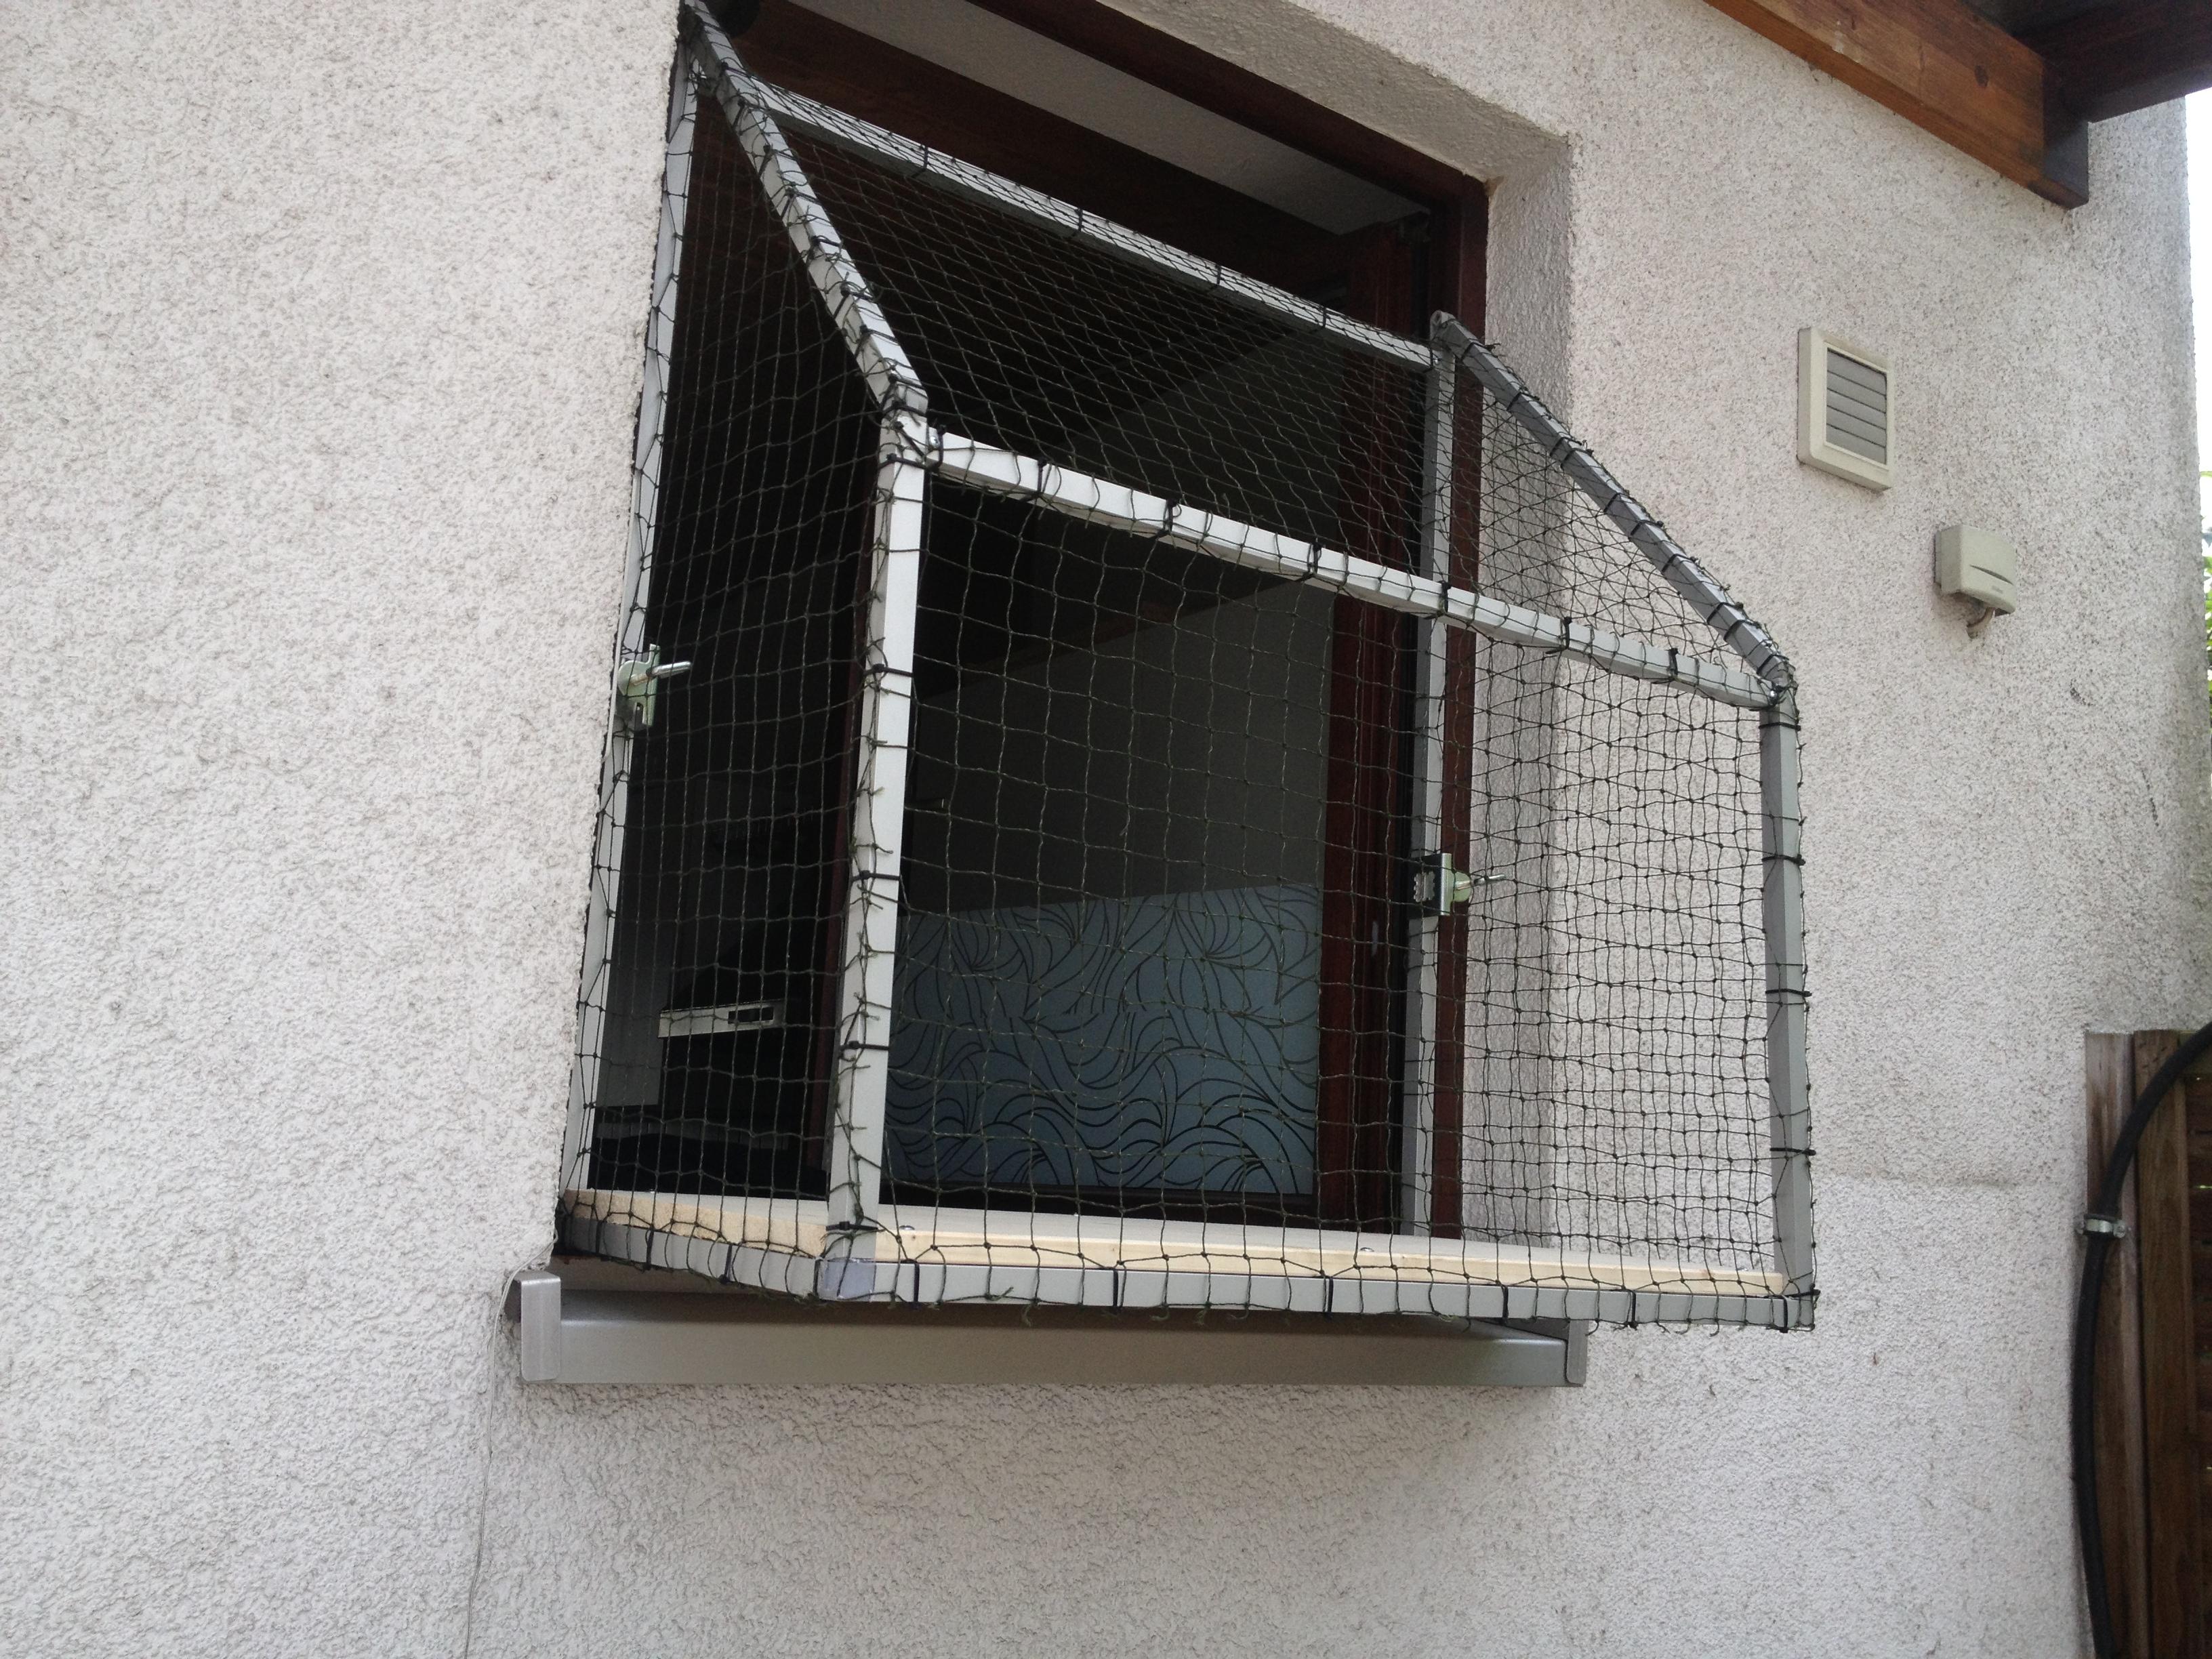 katzennetz fensterbalkon fensterbalkon f r katzen. Black Bedroom Furniture Sets. Home Design Ideas